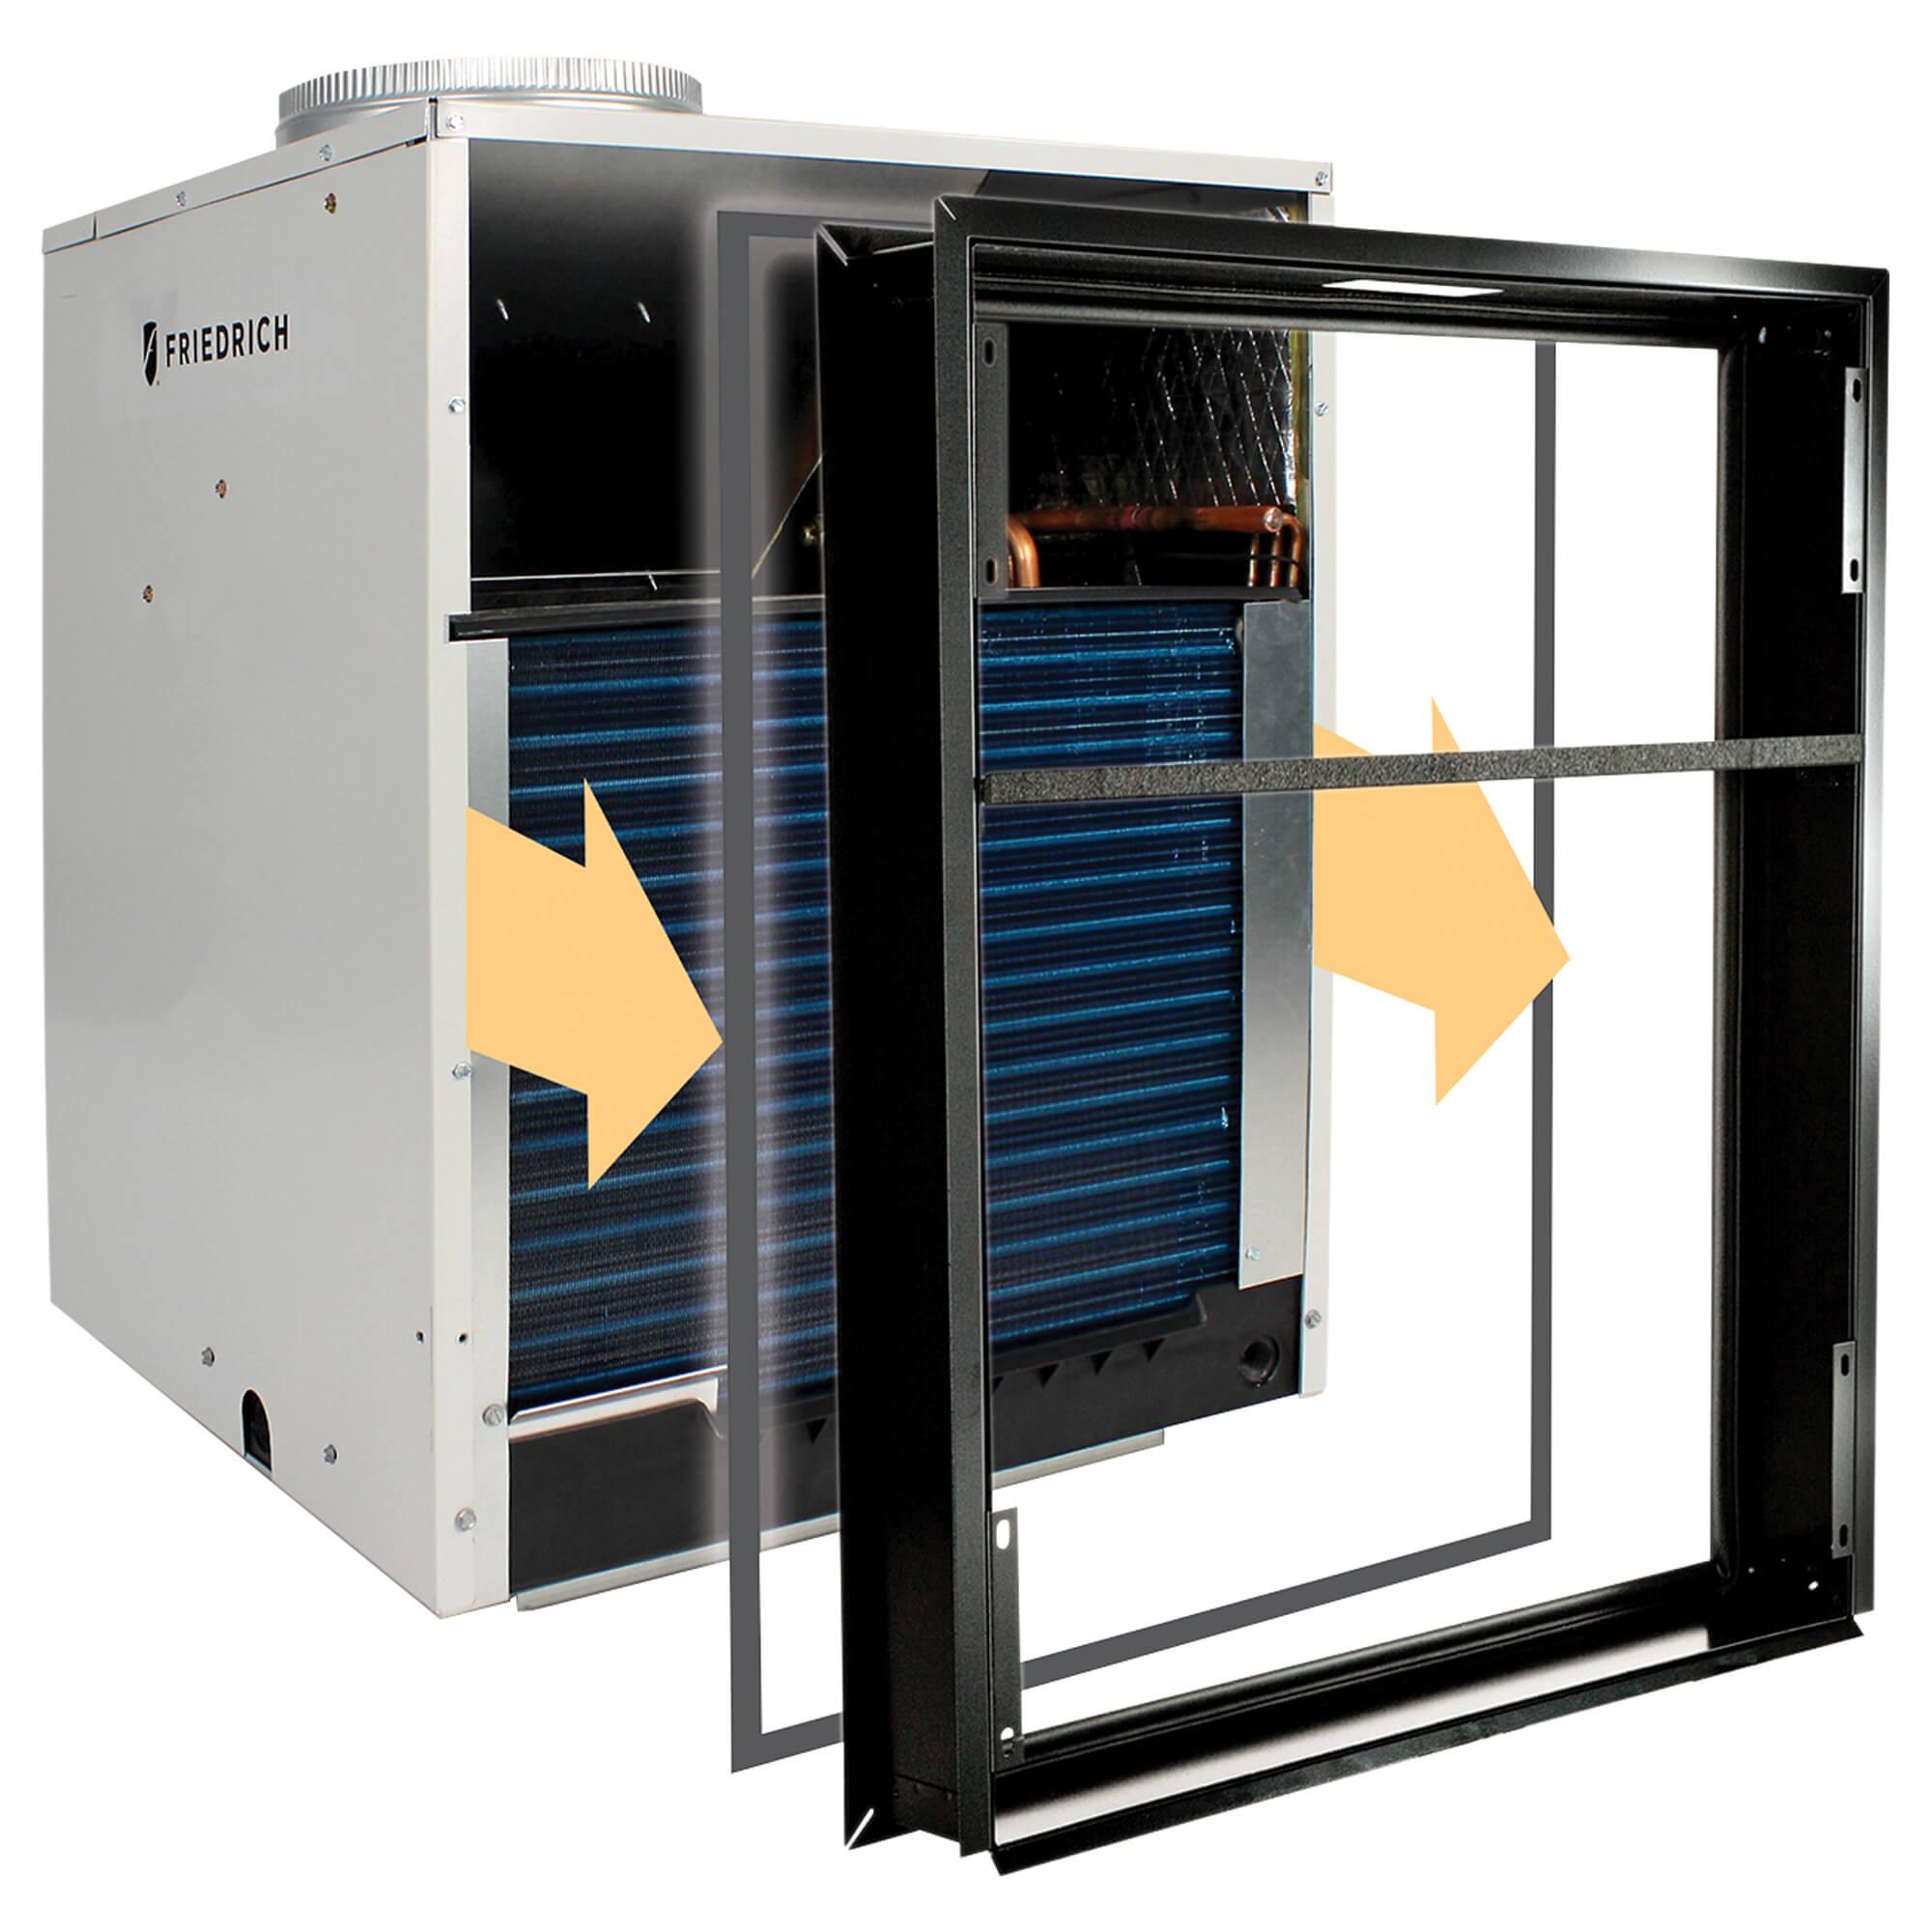 VERT-I-PAK_9-12_floating_chassis_2000